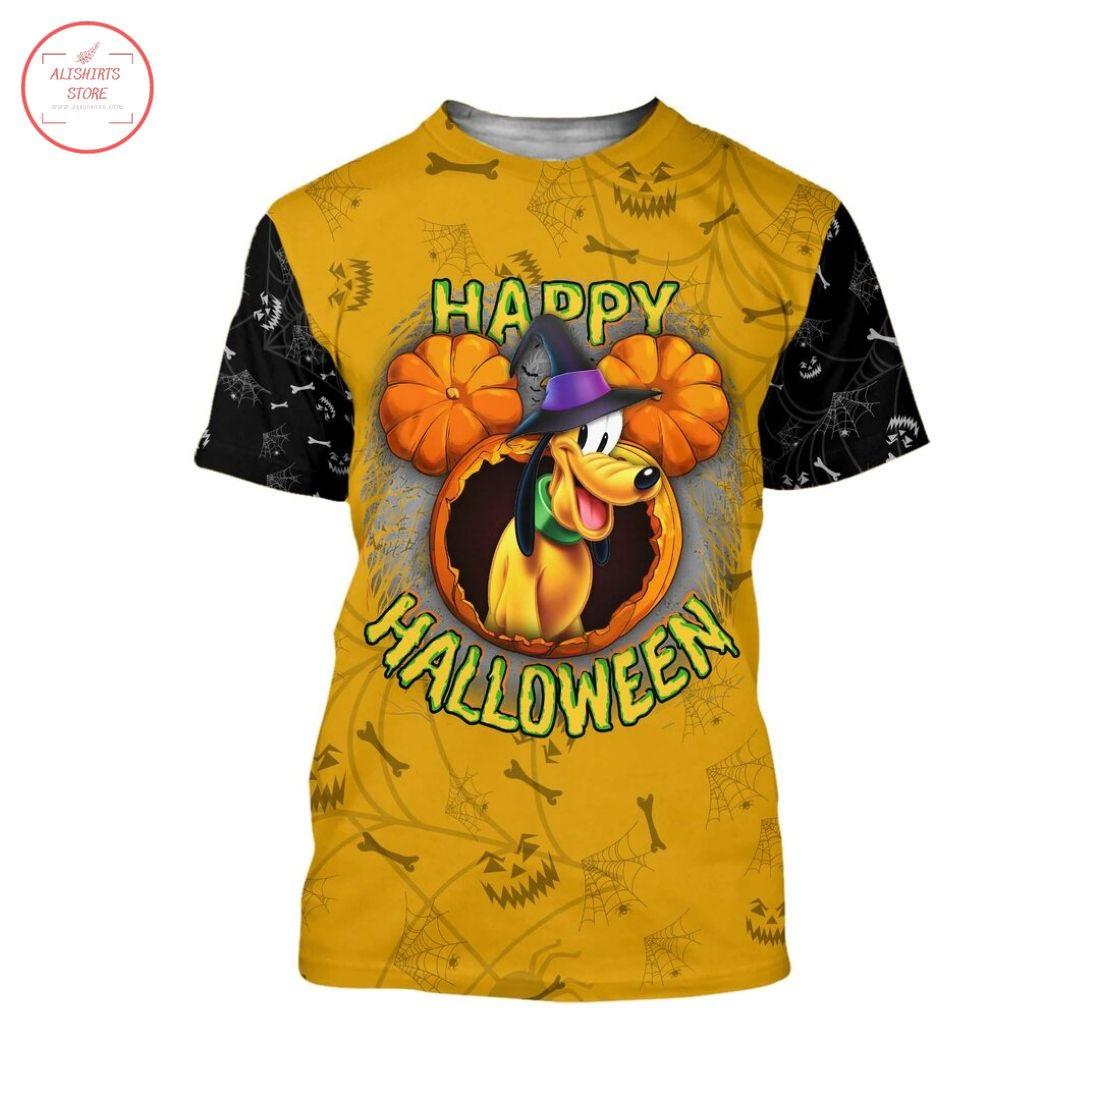 Pluto Dog Disney Happy Halloween Shirt